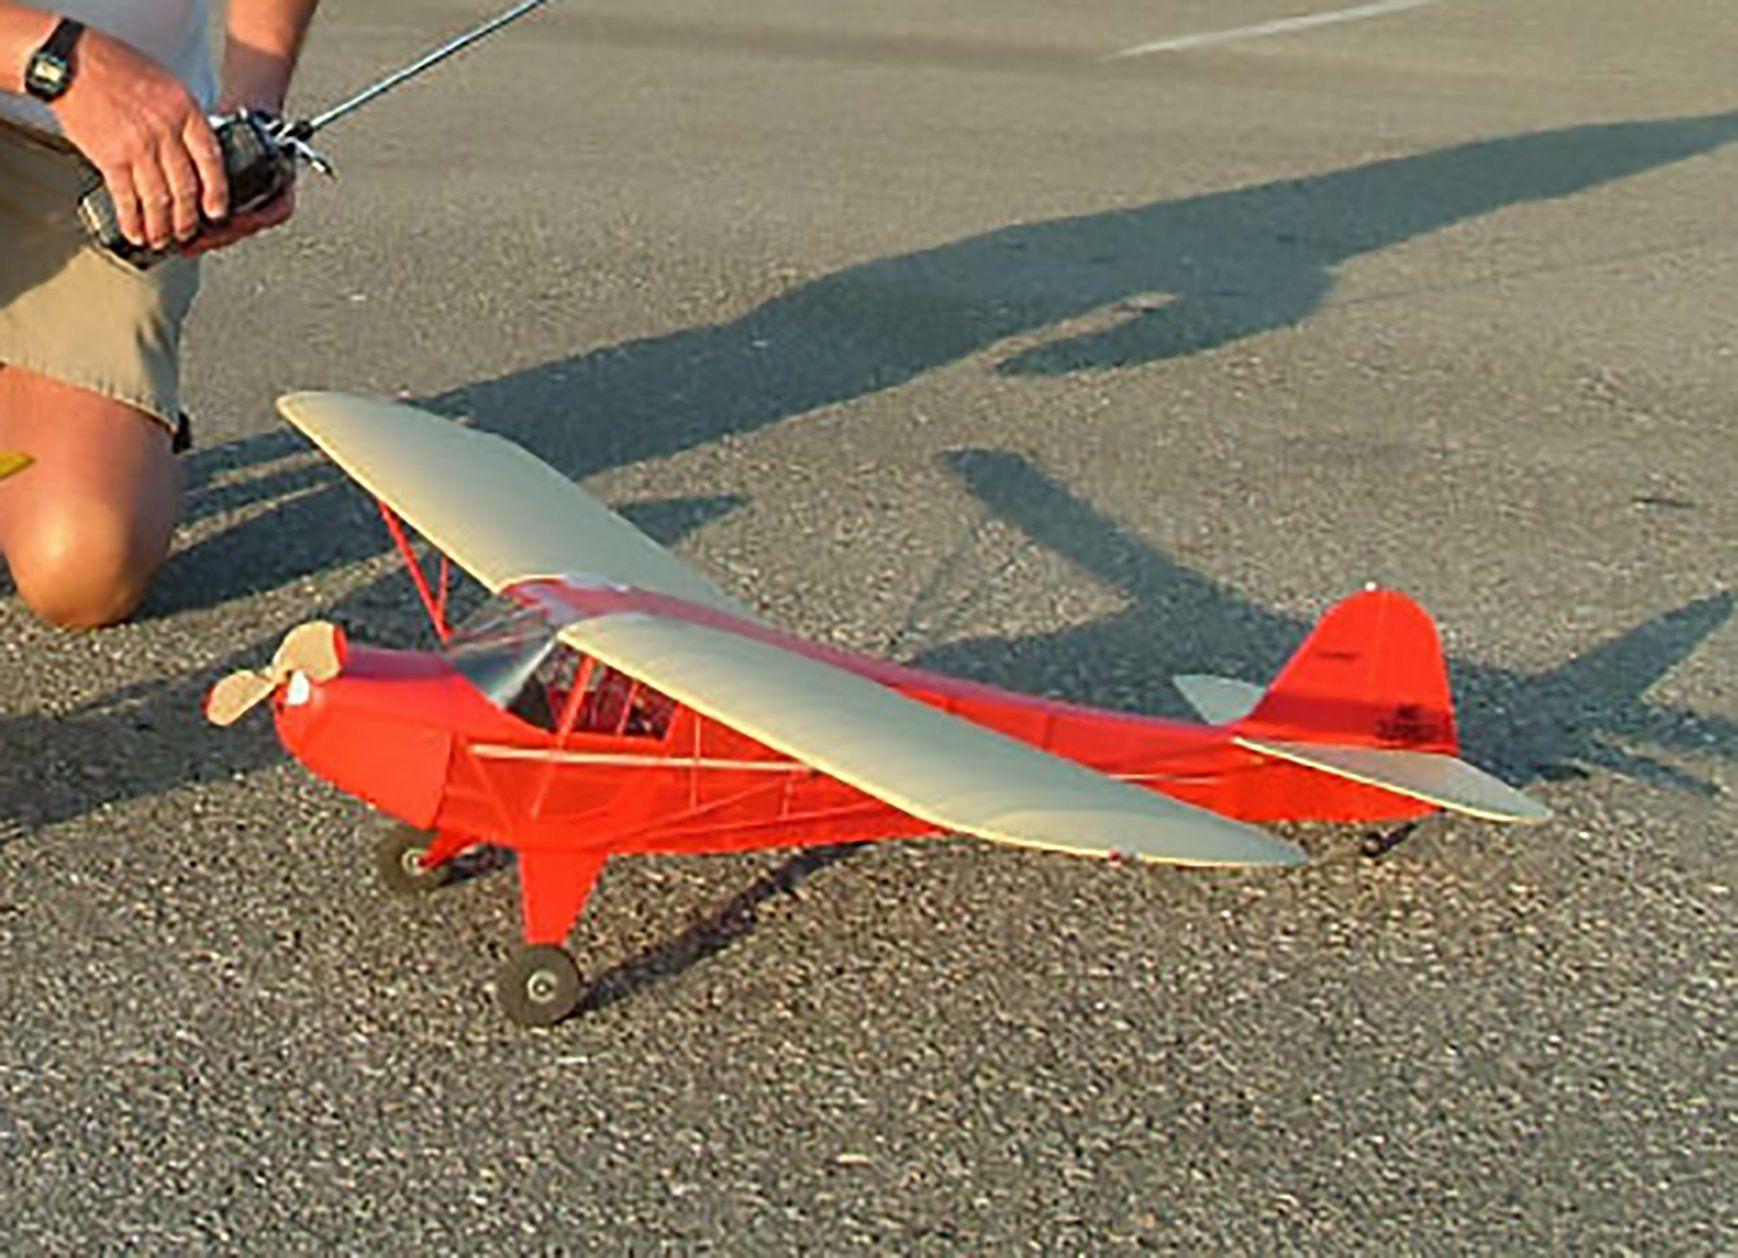 Pin On Tmrc Aircraft Plans And Kits